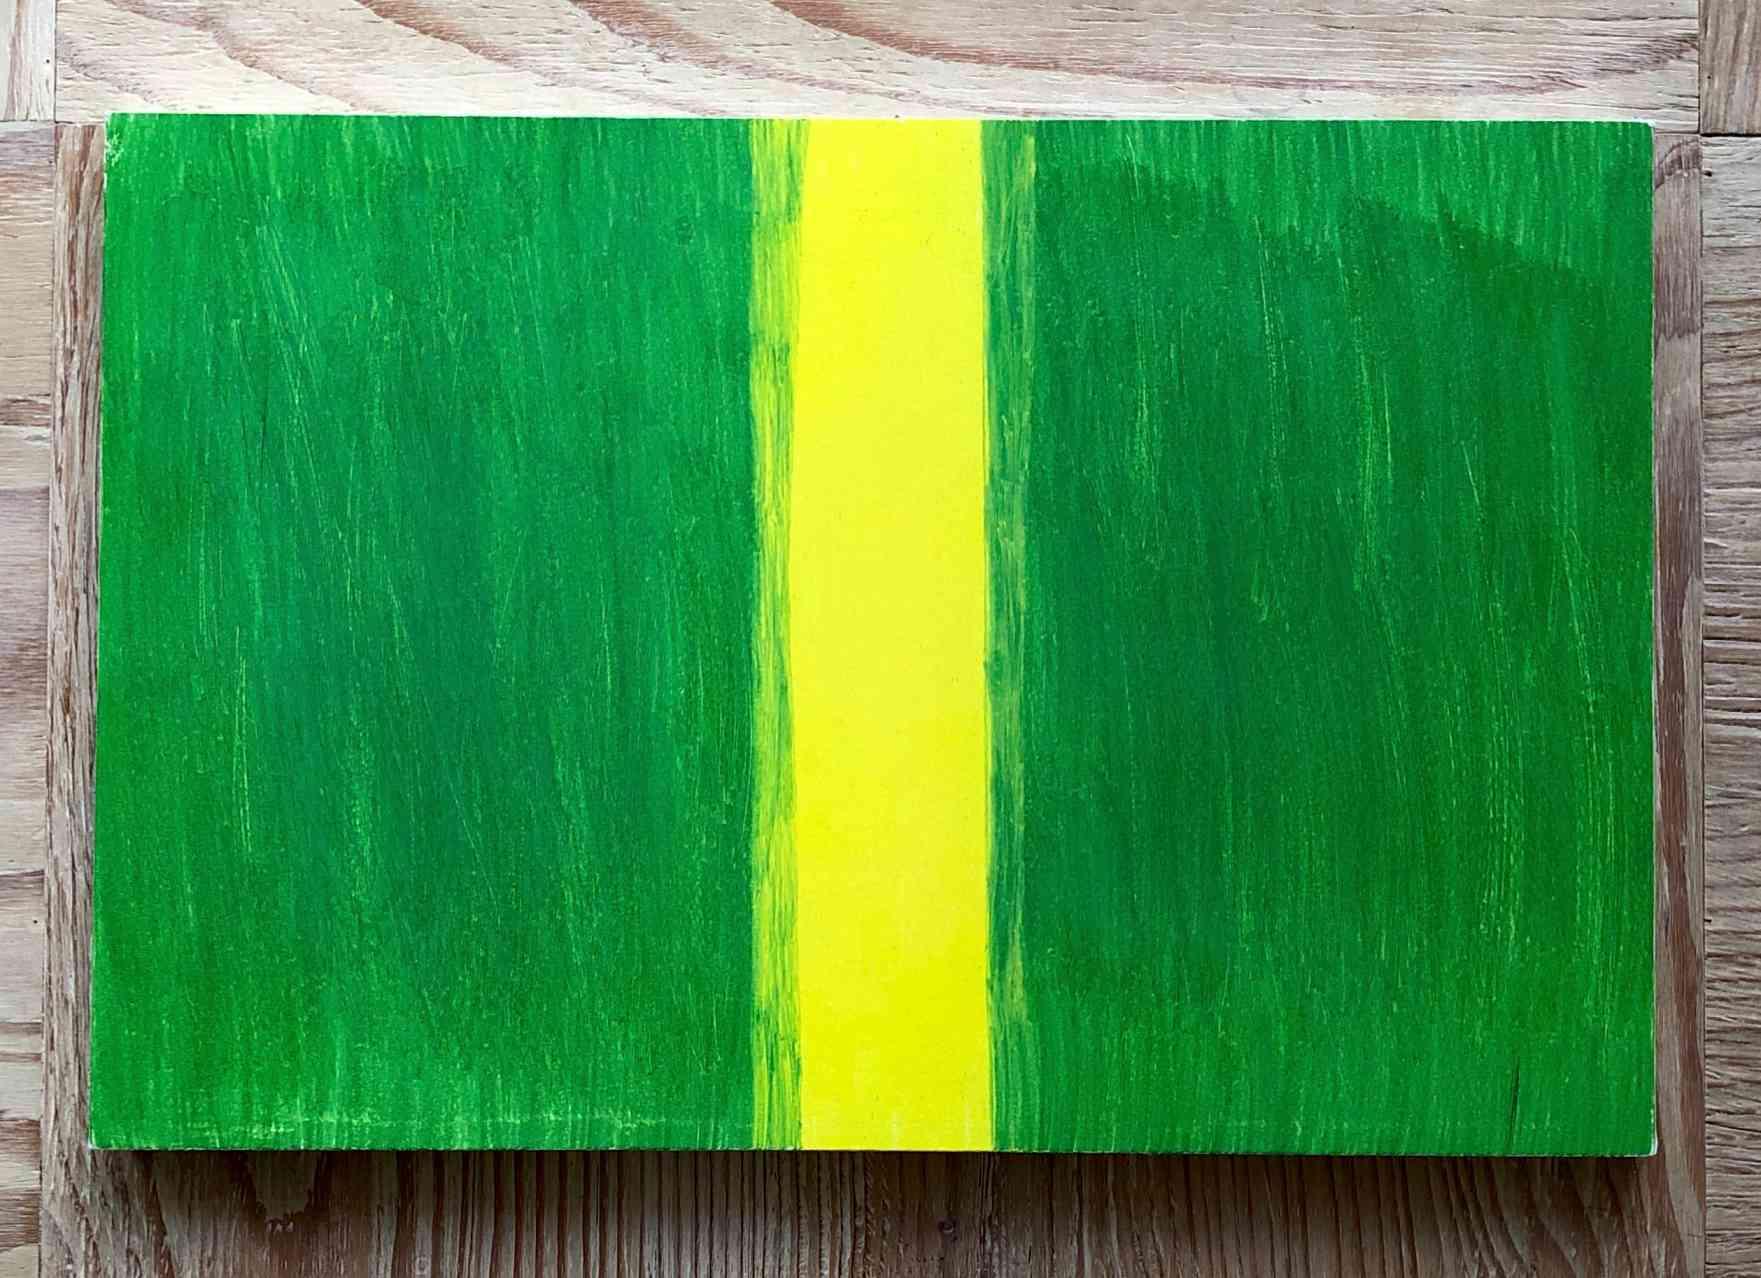 Moss green/Lemon yellow